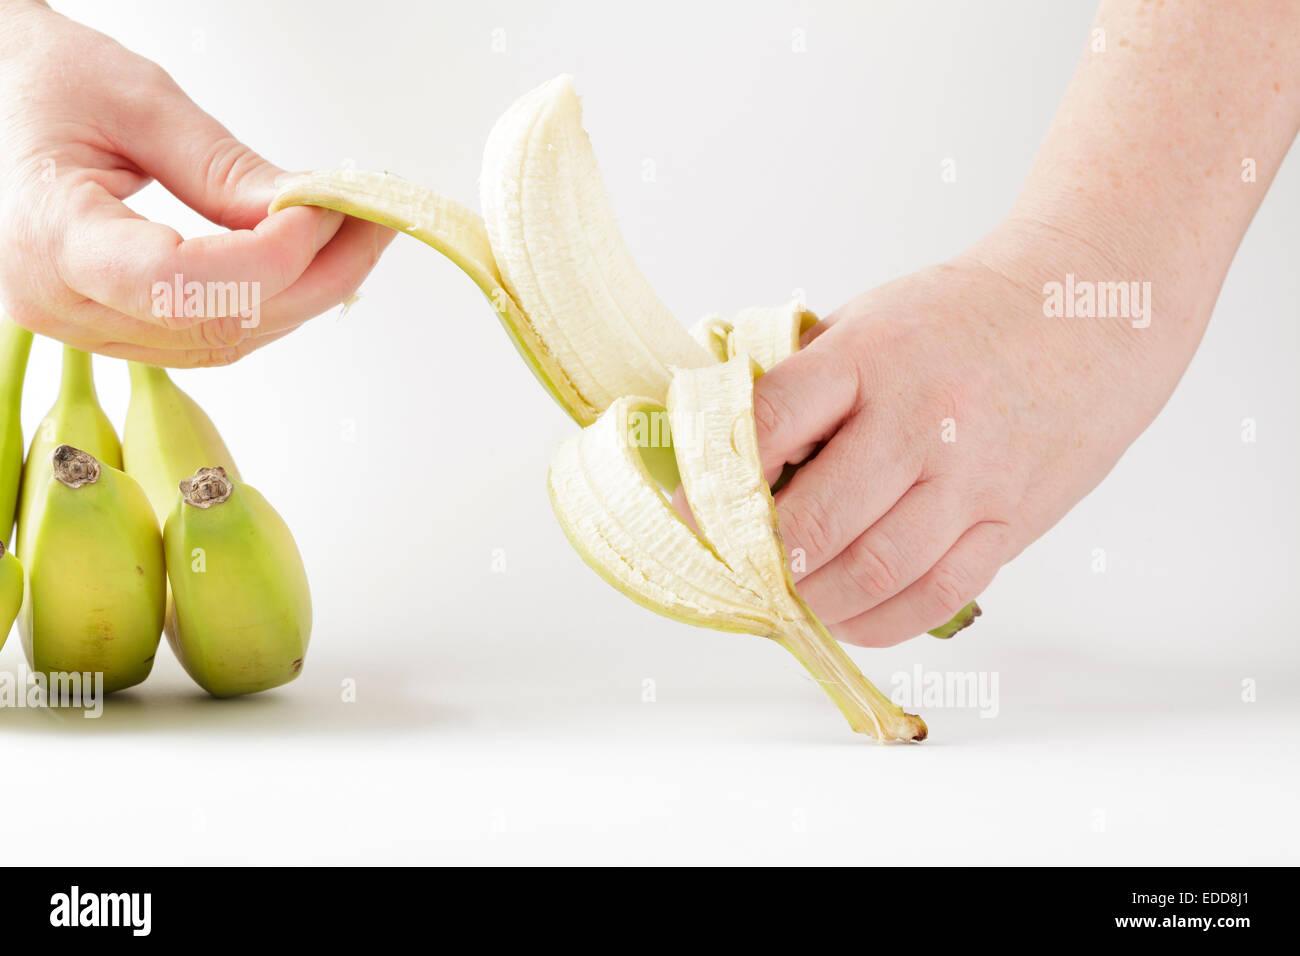 Peler les mains une banane Photo Stock